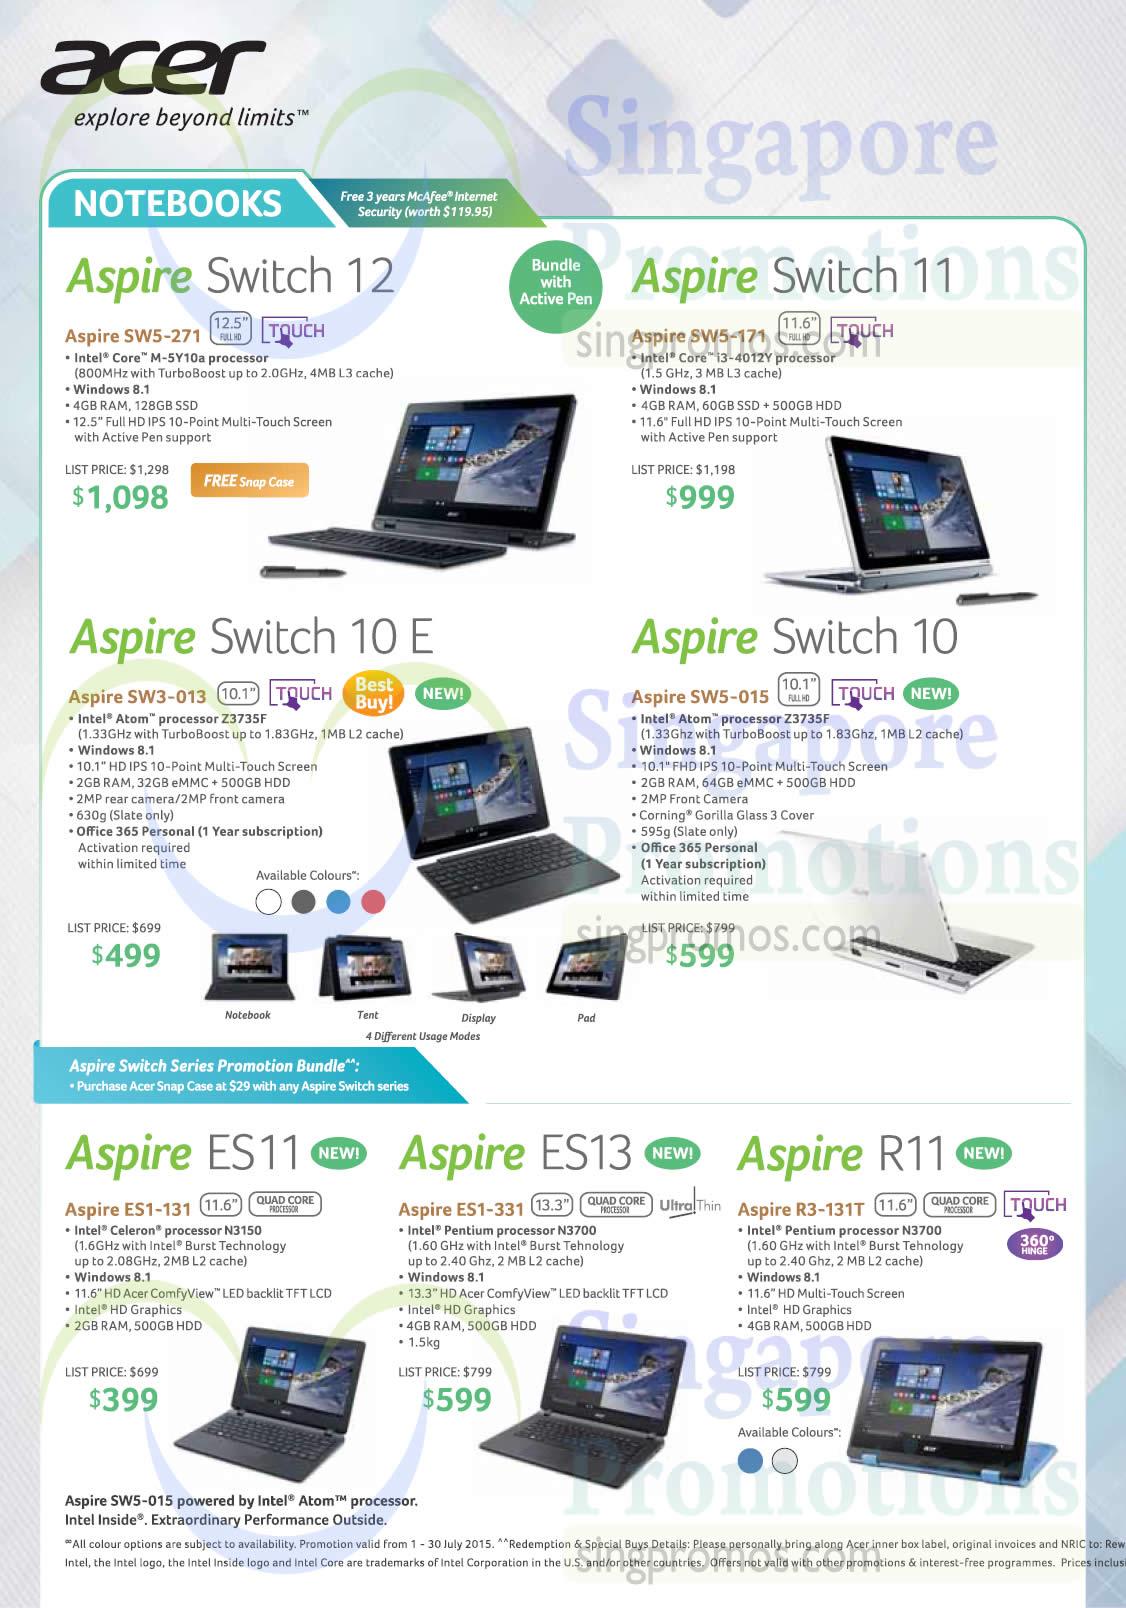 Notebooks Aspire Switch 12 Sw5 271 11 171 10 E Acer Es1 131 Sw3 013 331